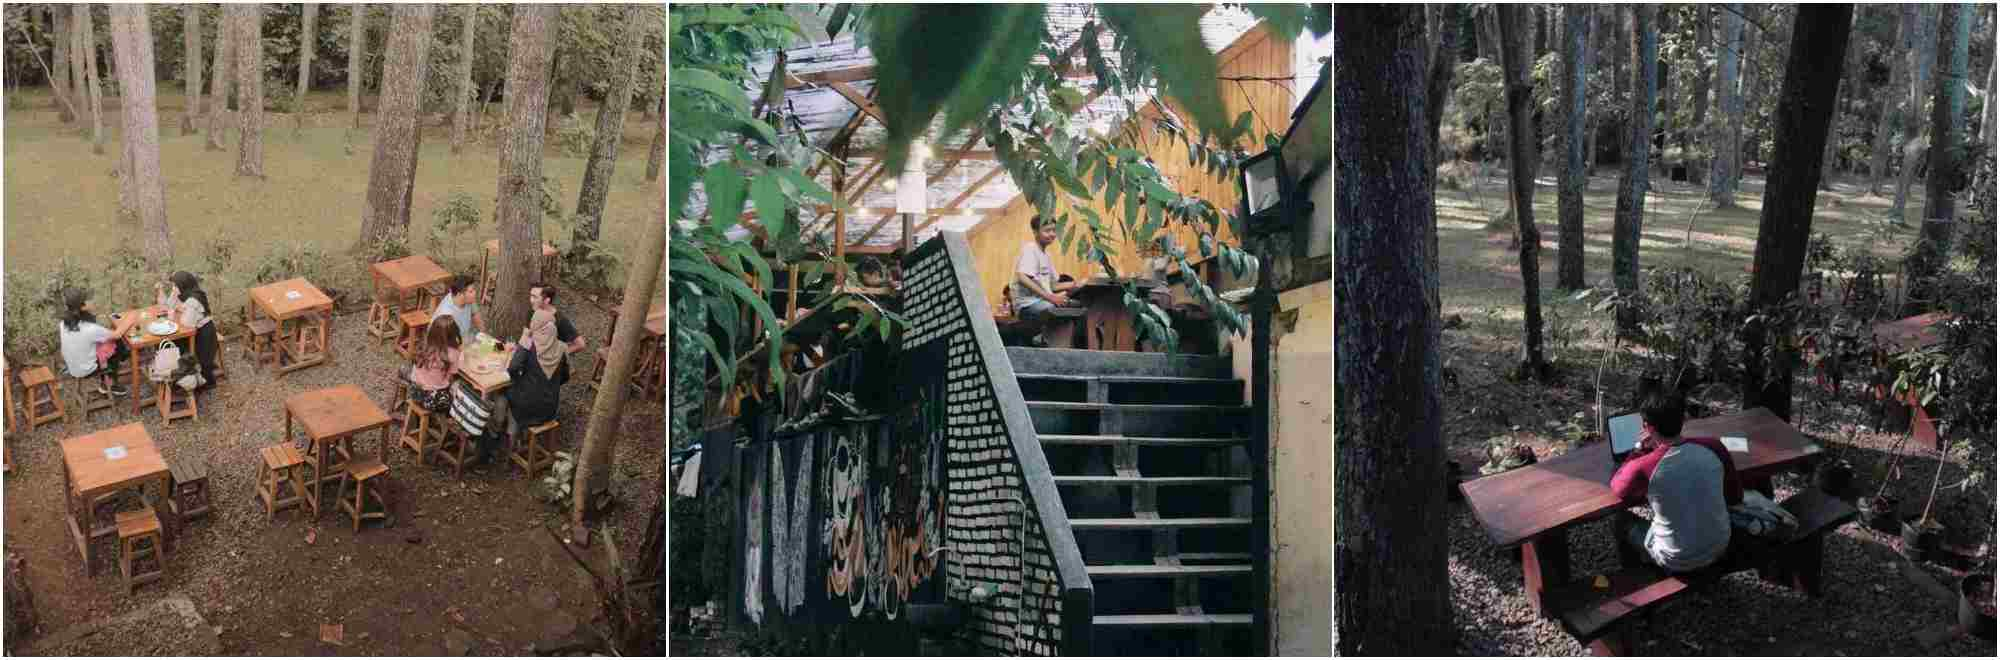 Kopi Tahura | cafe hutan bandung